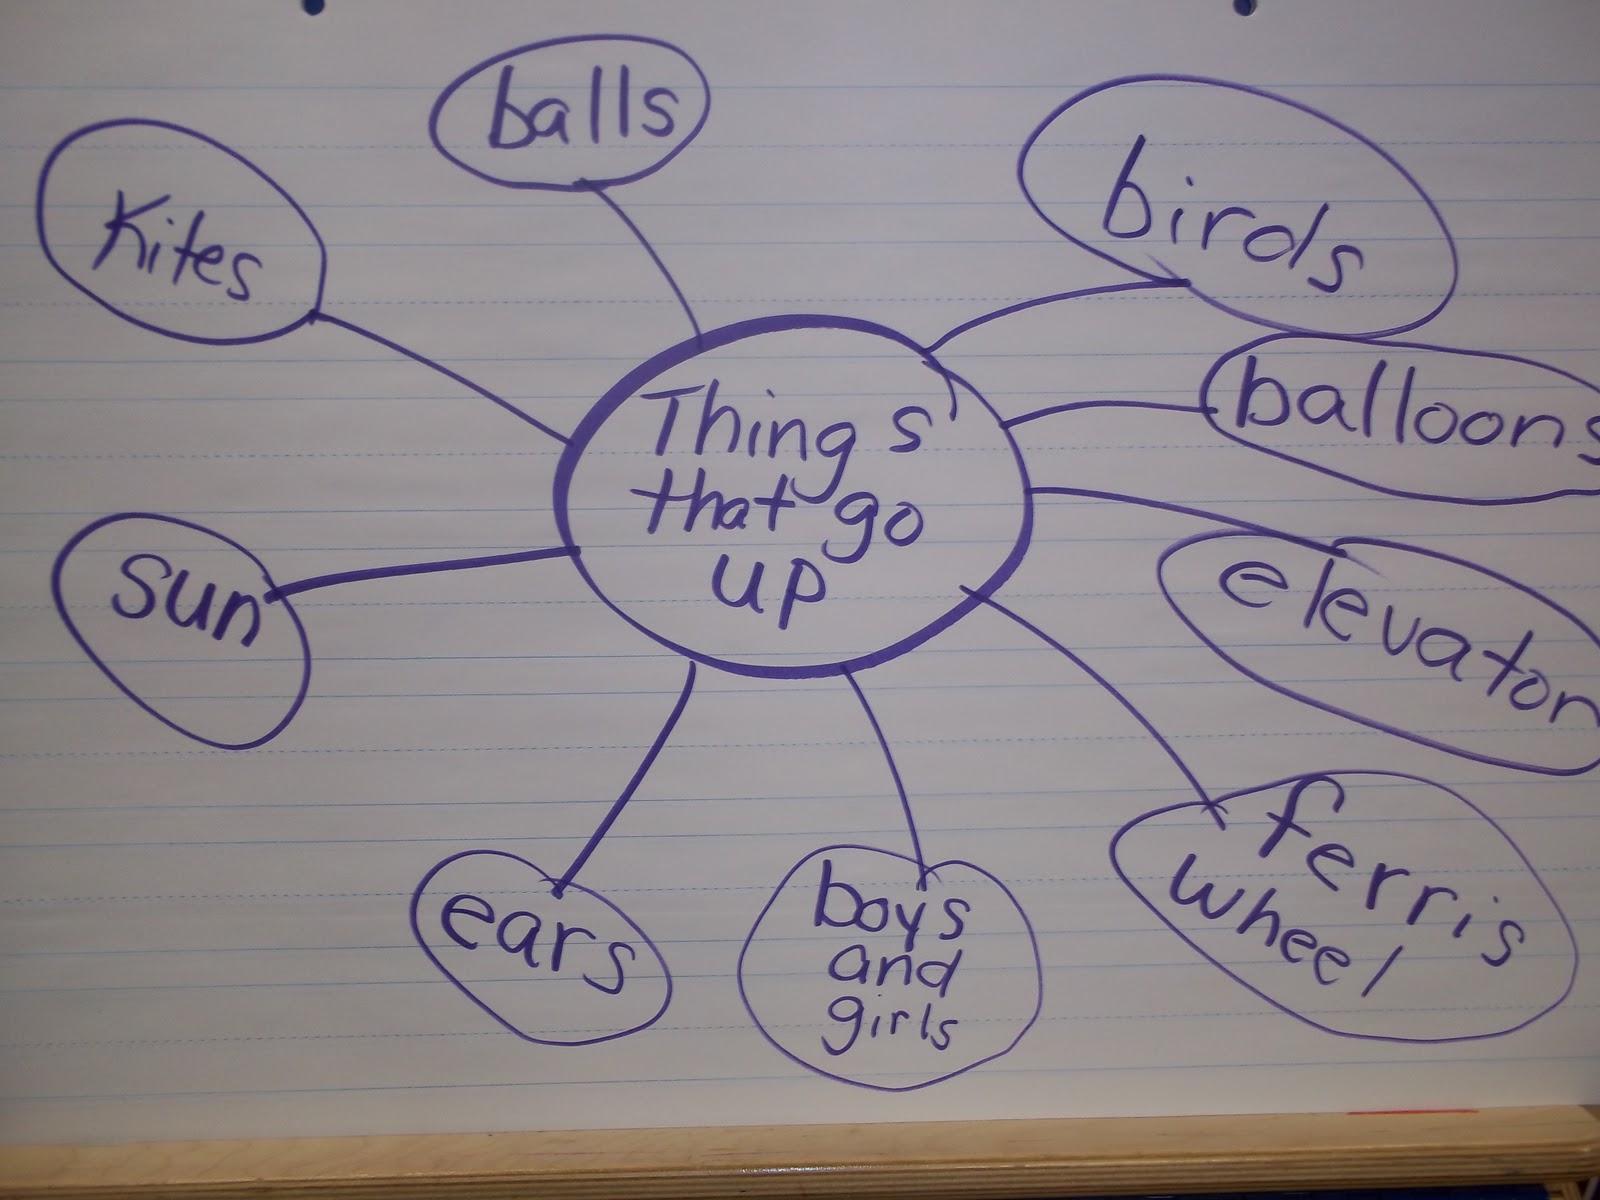 Kinder Garden: Mrs. Wood's Kindergarten Class: A Great Day For Up